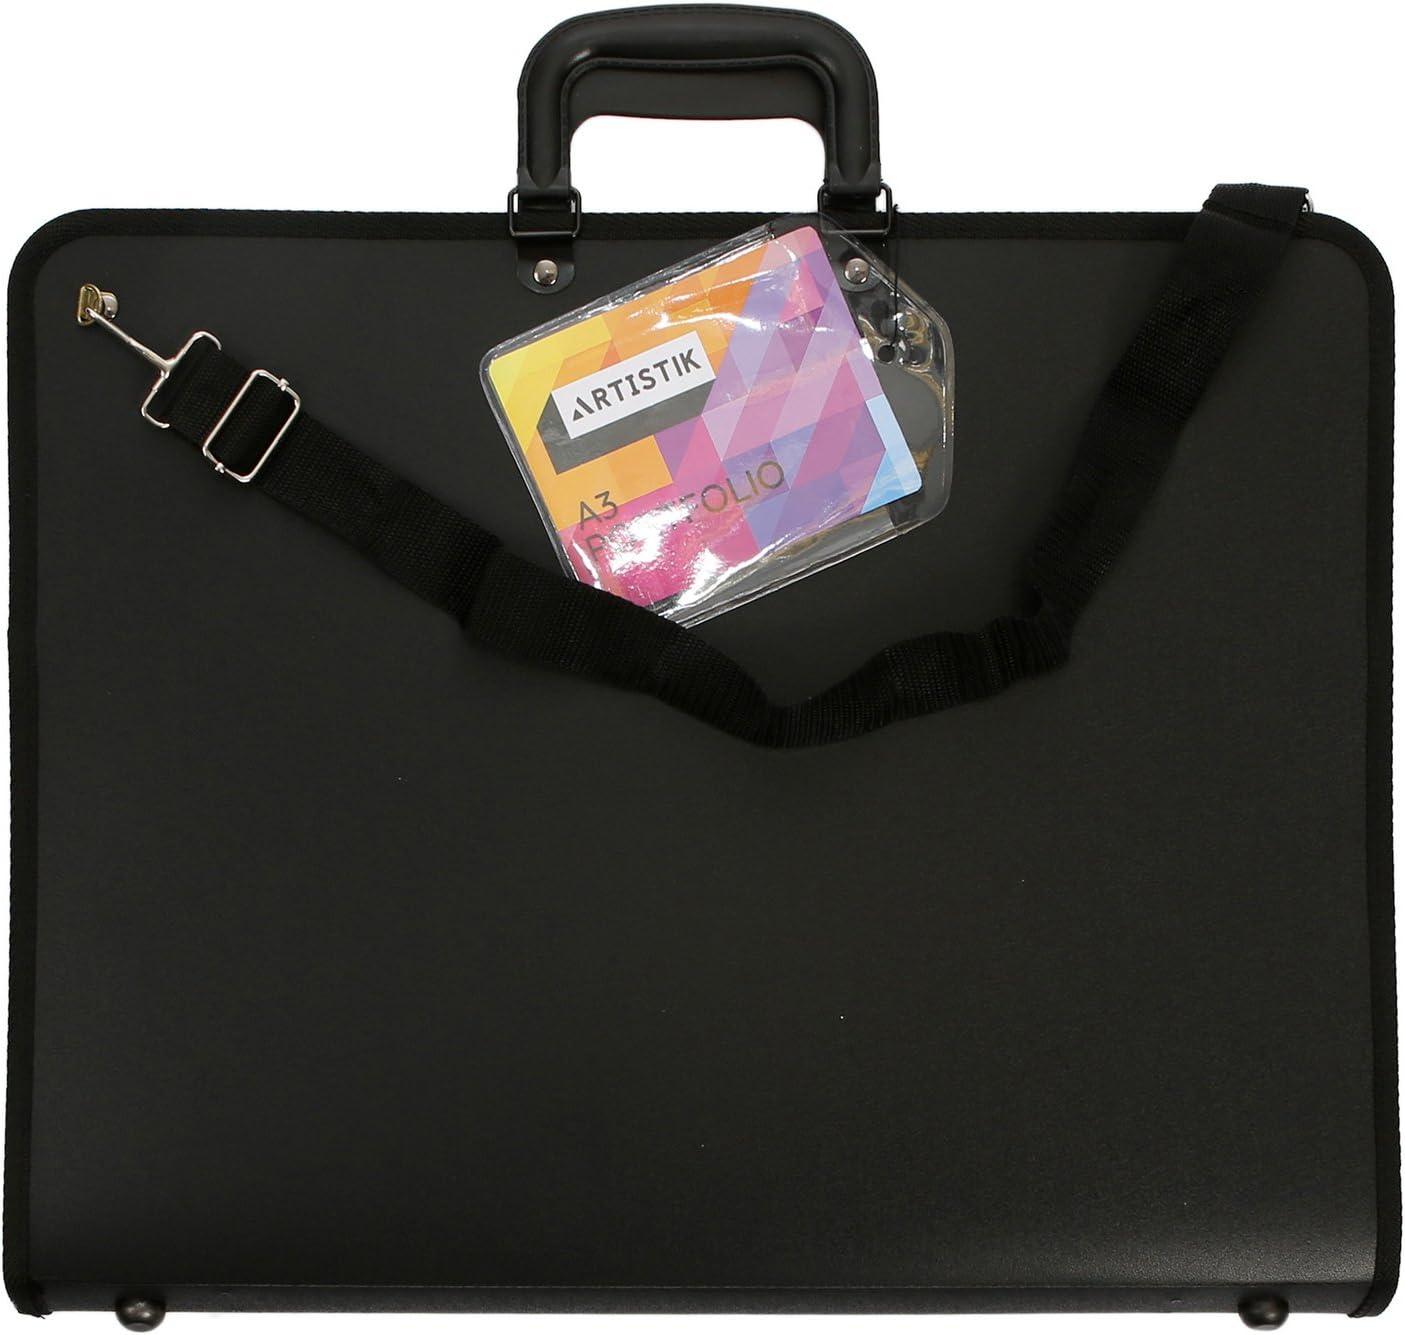 A1 Artist Portfolio Carrying Case with Shoulder Strap A1-35.1 x 26 x 1.7 Art Portfolio Case Weather-Resistant Student Portfolio Drawing Painting Sketch Bag by Artistik